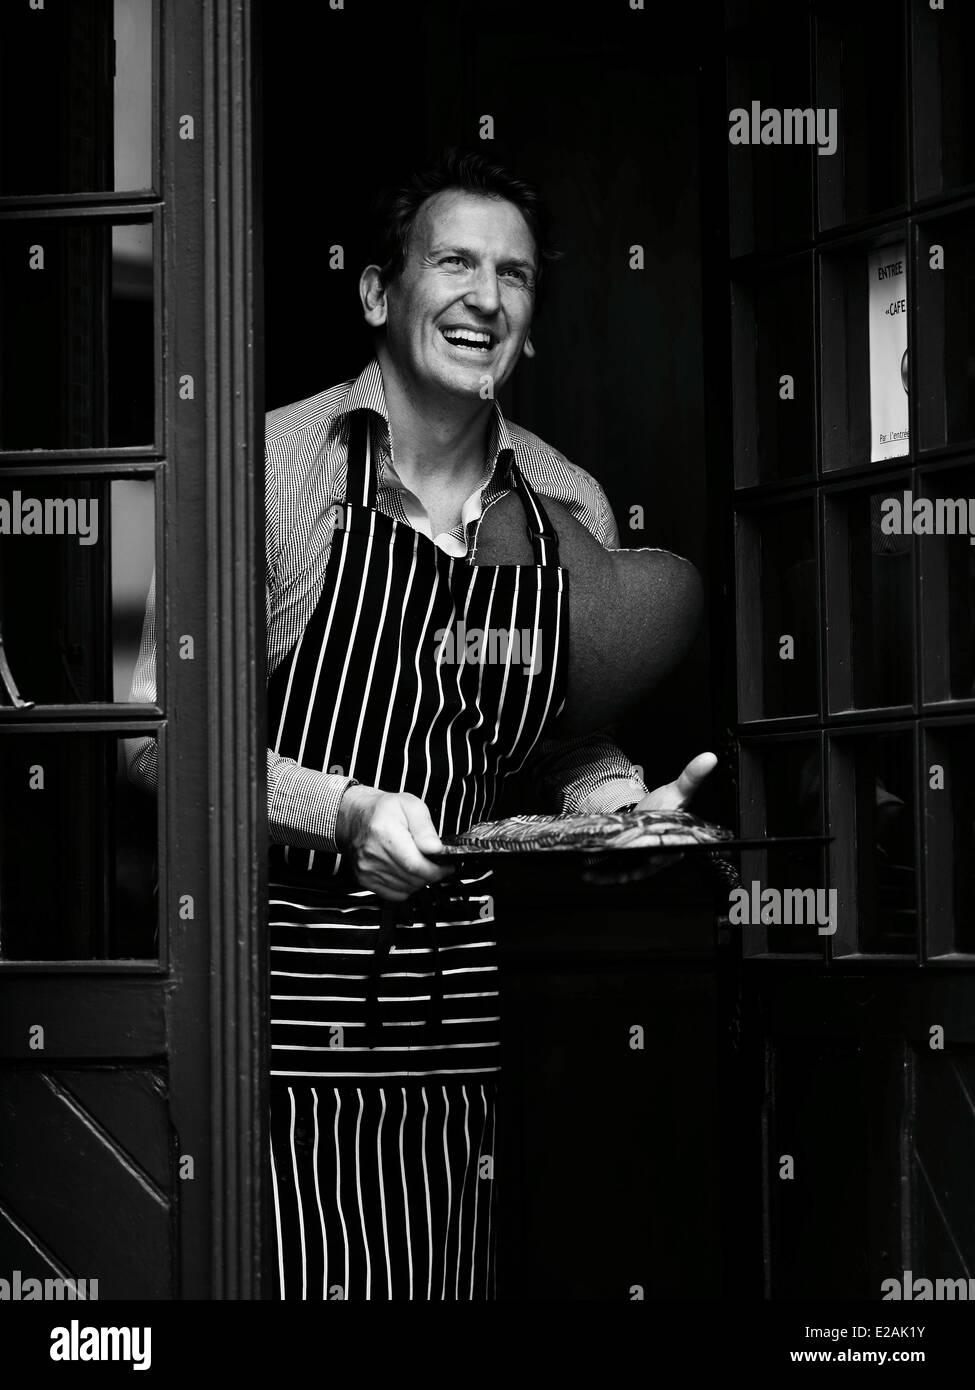 France, Alsace, feature : Felder's Alsace, Christophe Felder portrait, pastry chef Stock Photo